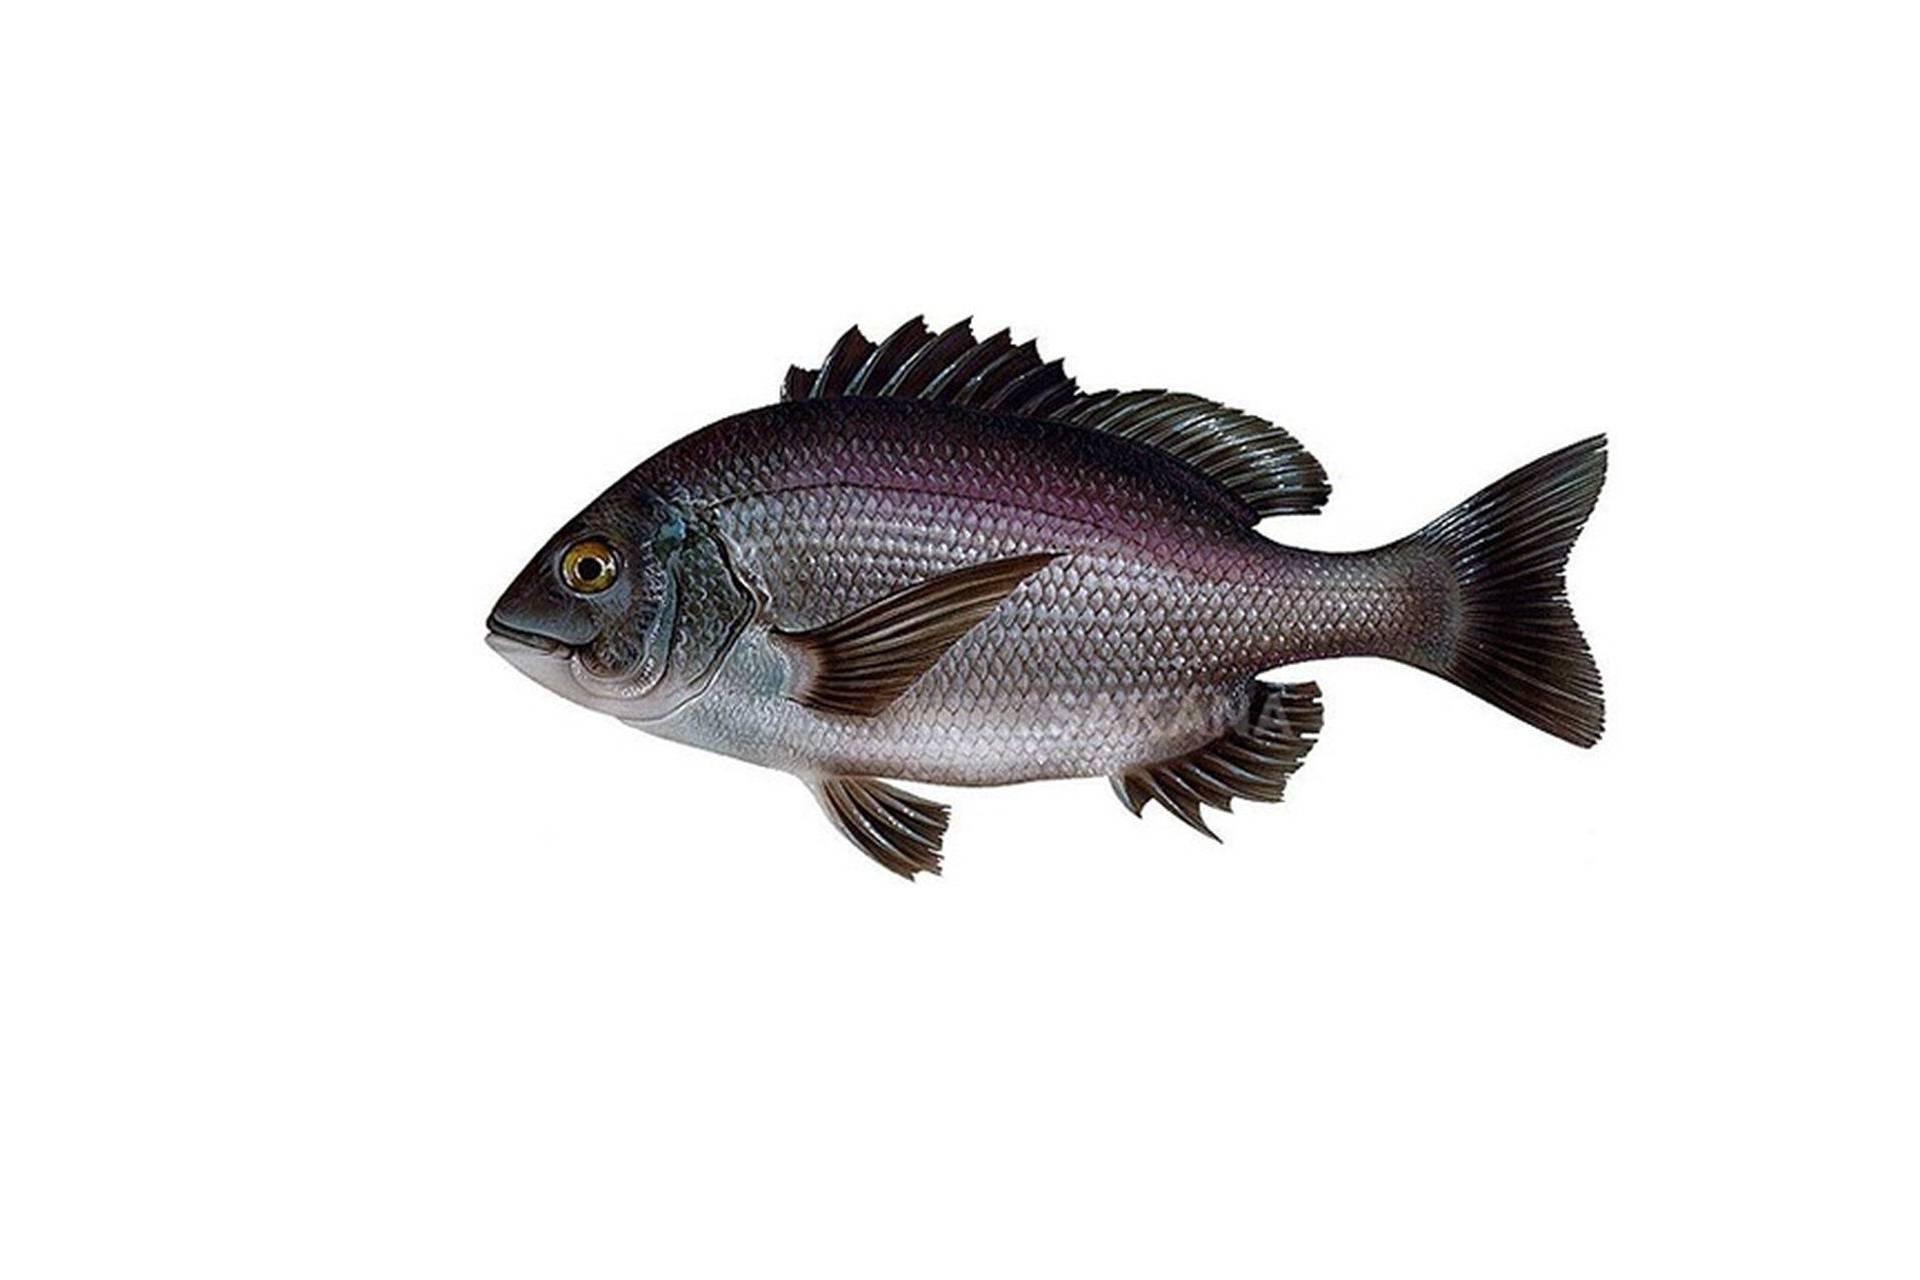 Места обитания и повадки морского карася, или ласкиря